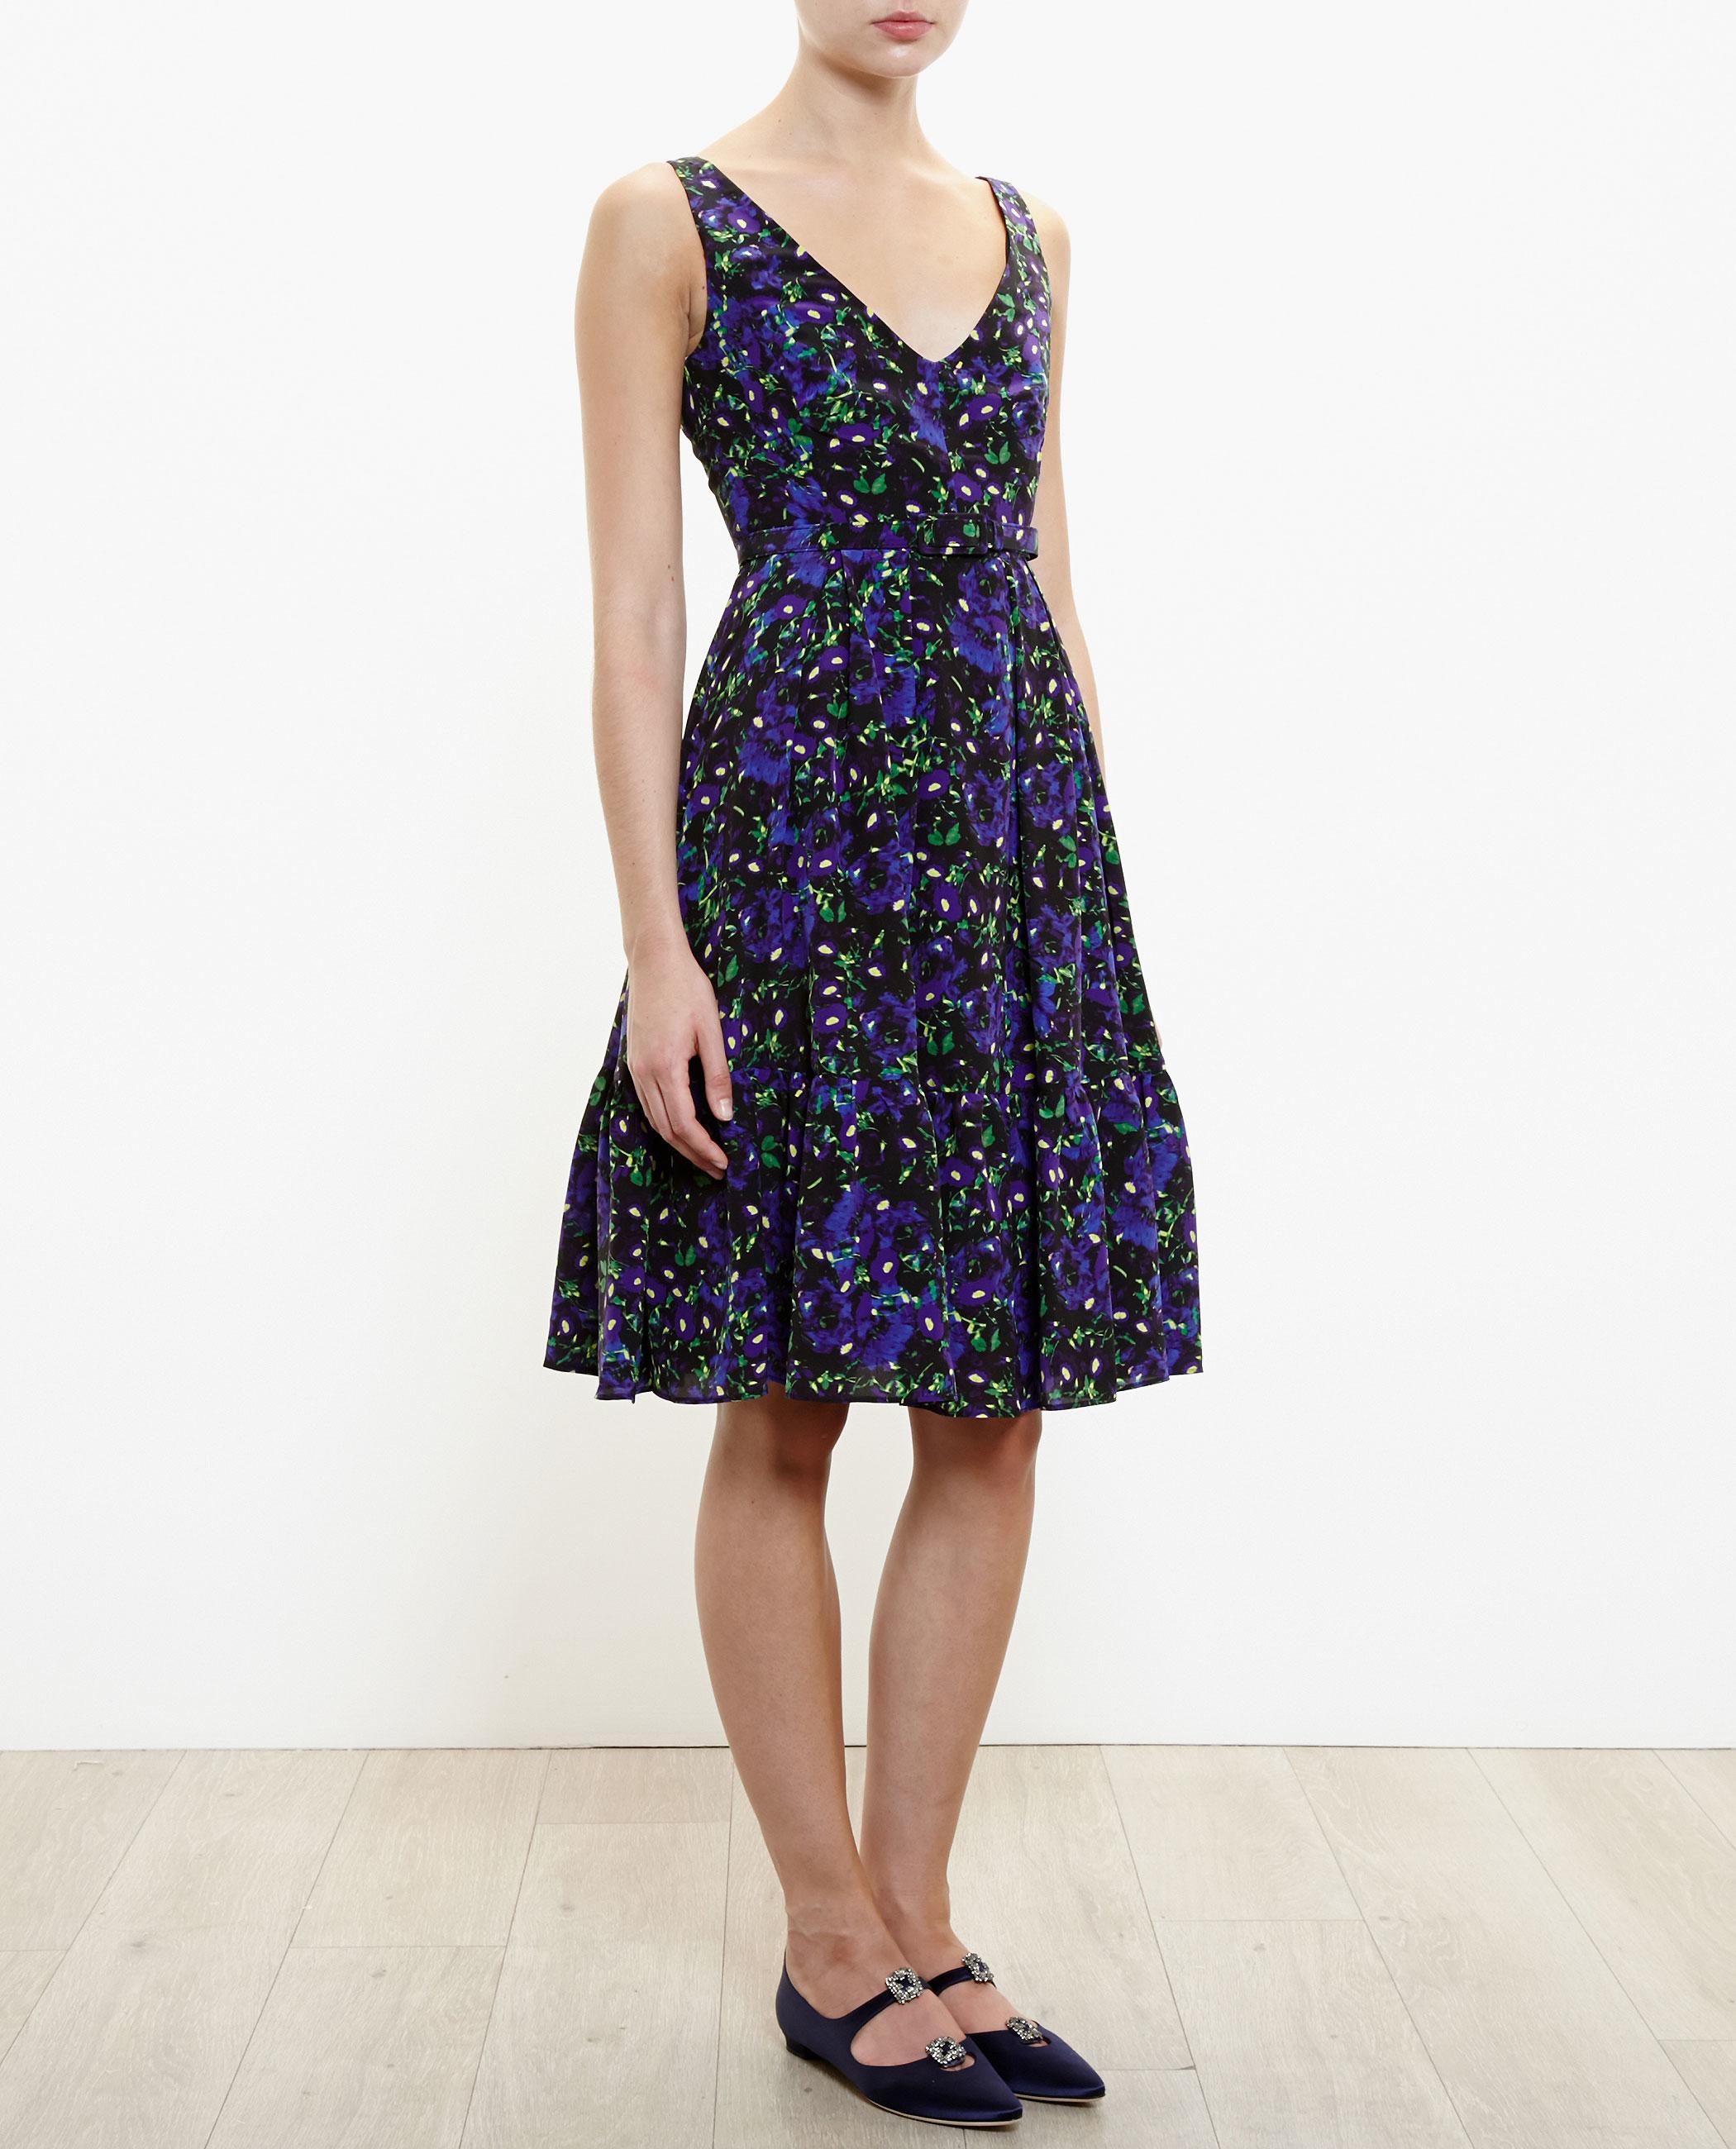 Fresh Erdem Gown | Entrancing Erdem Dress